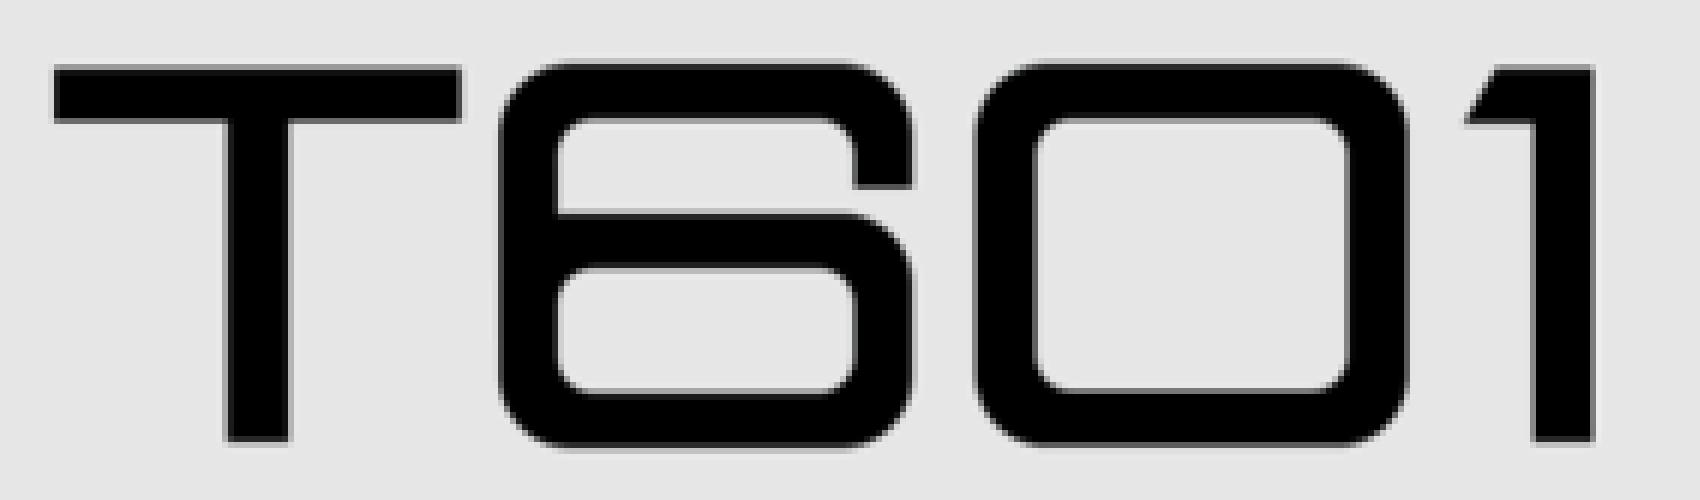 T601株式会社